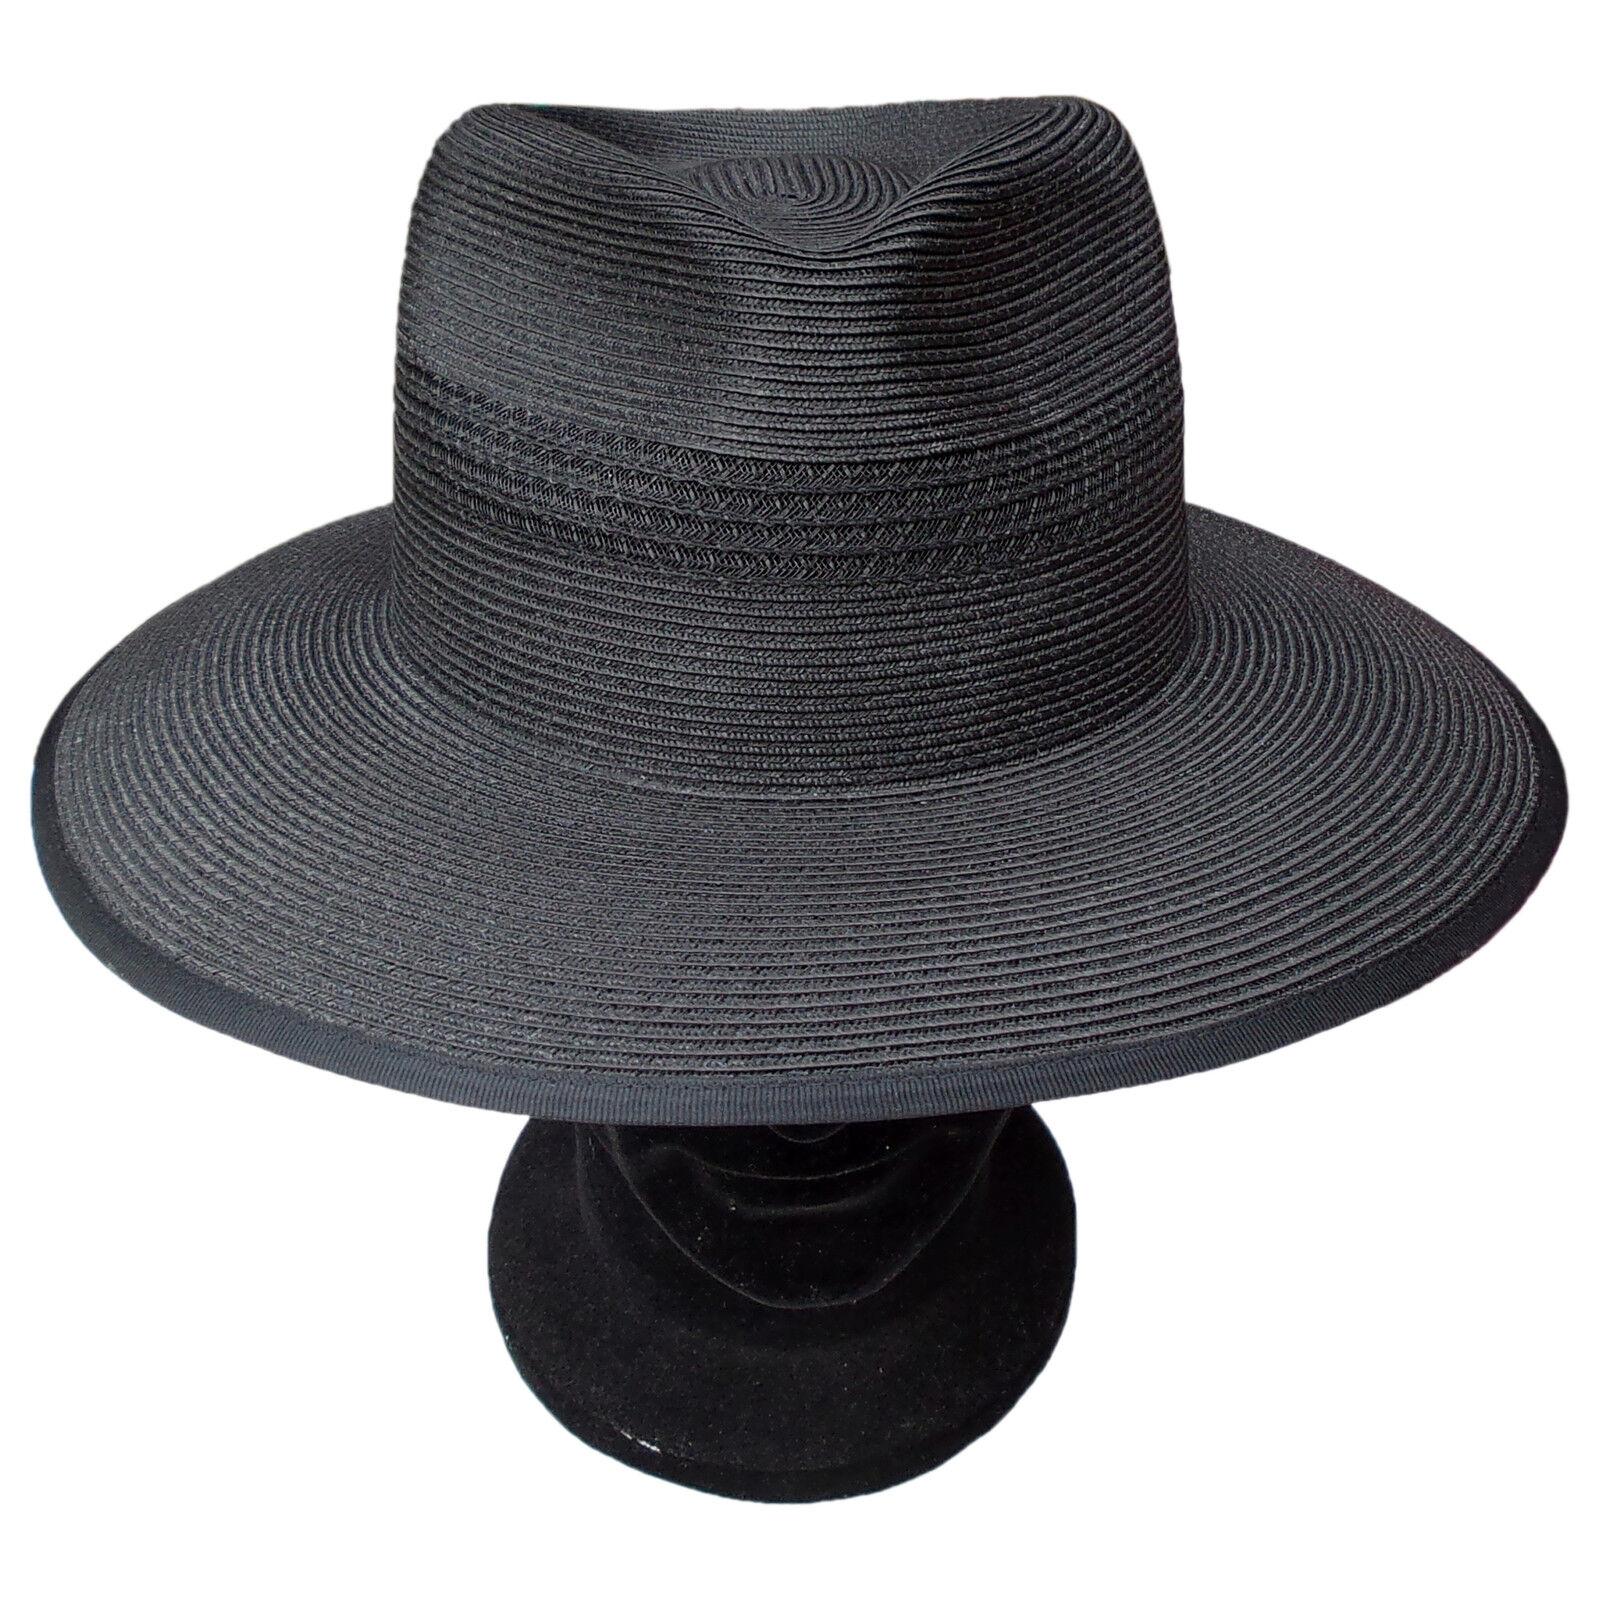 Acclaim Headwear Gewebt Weiß Schwarz Kalgoorlie Cricket Schiedsrichter Schiedsrichter Schiedsrichter Hut Plus 16431e